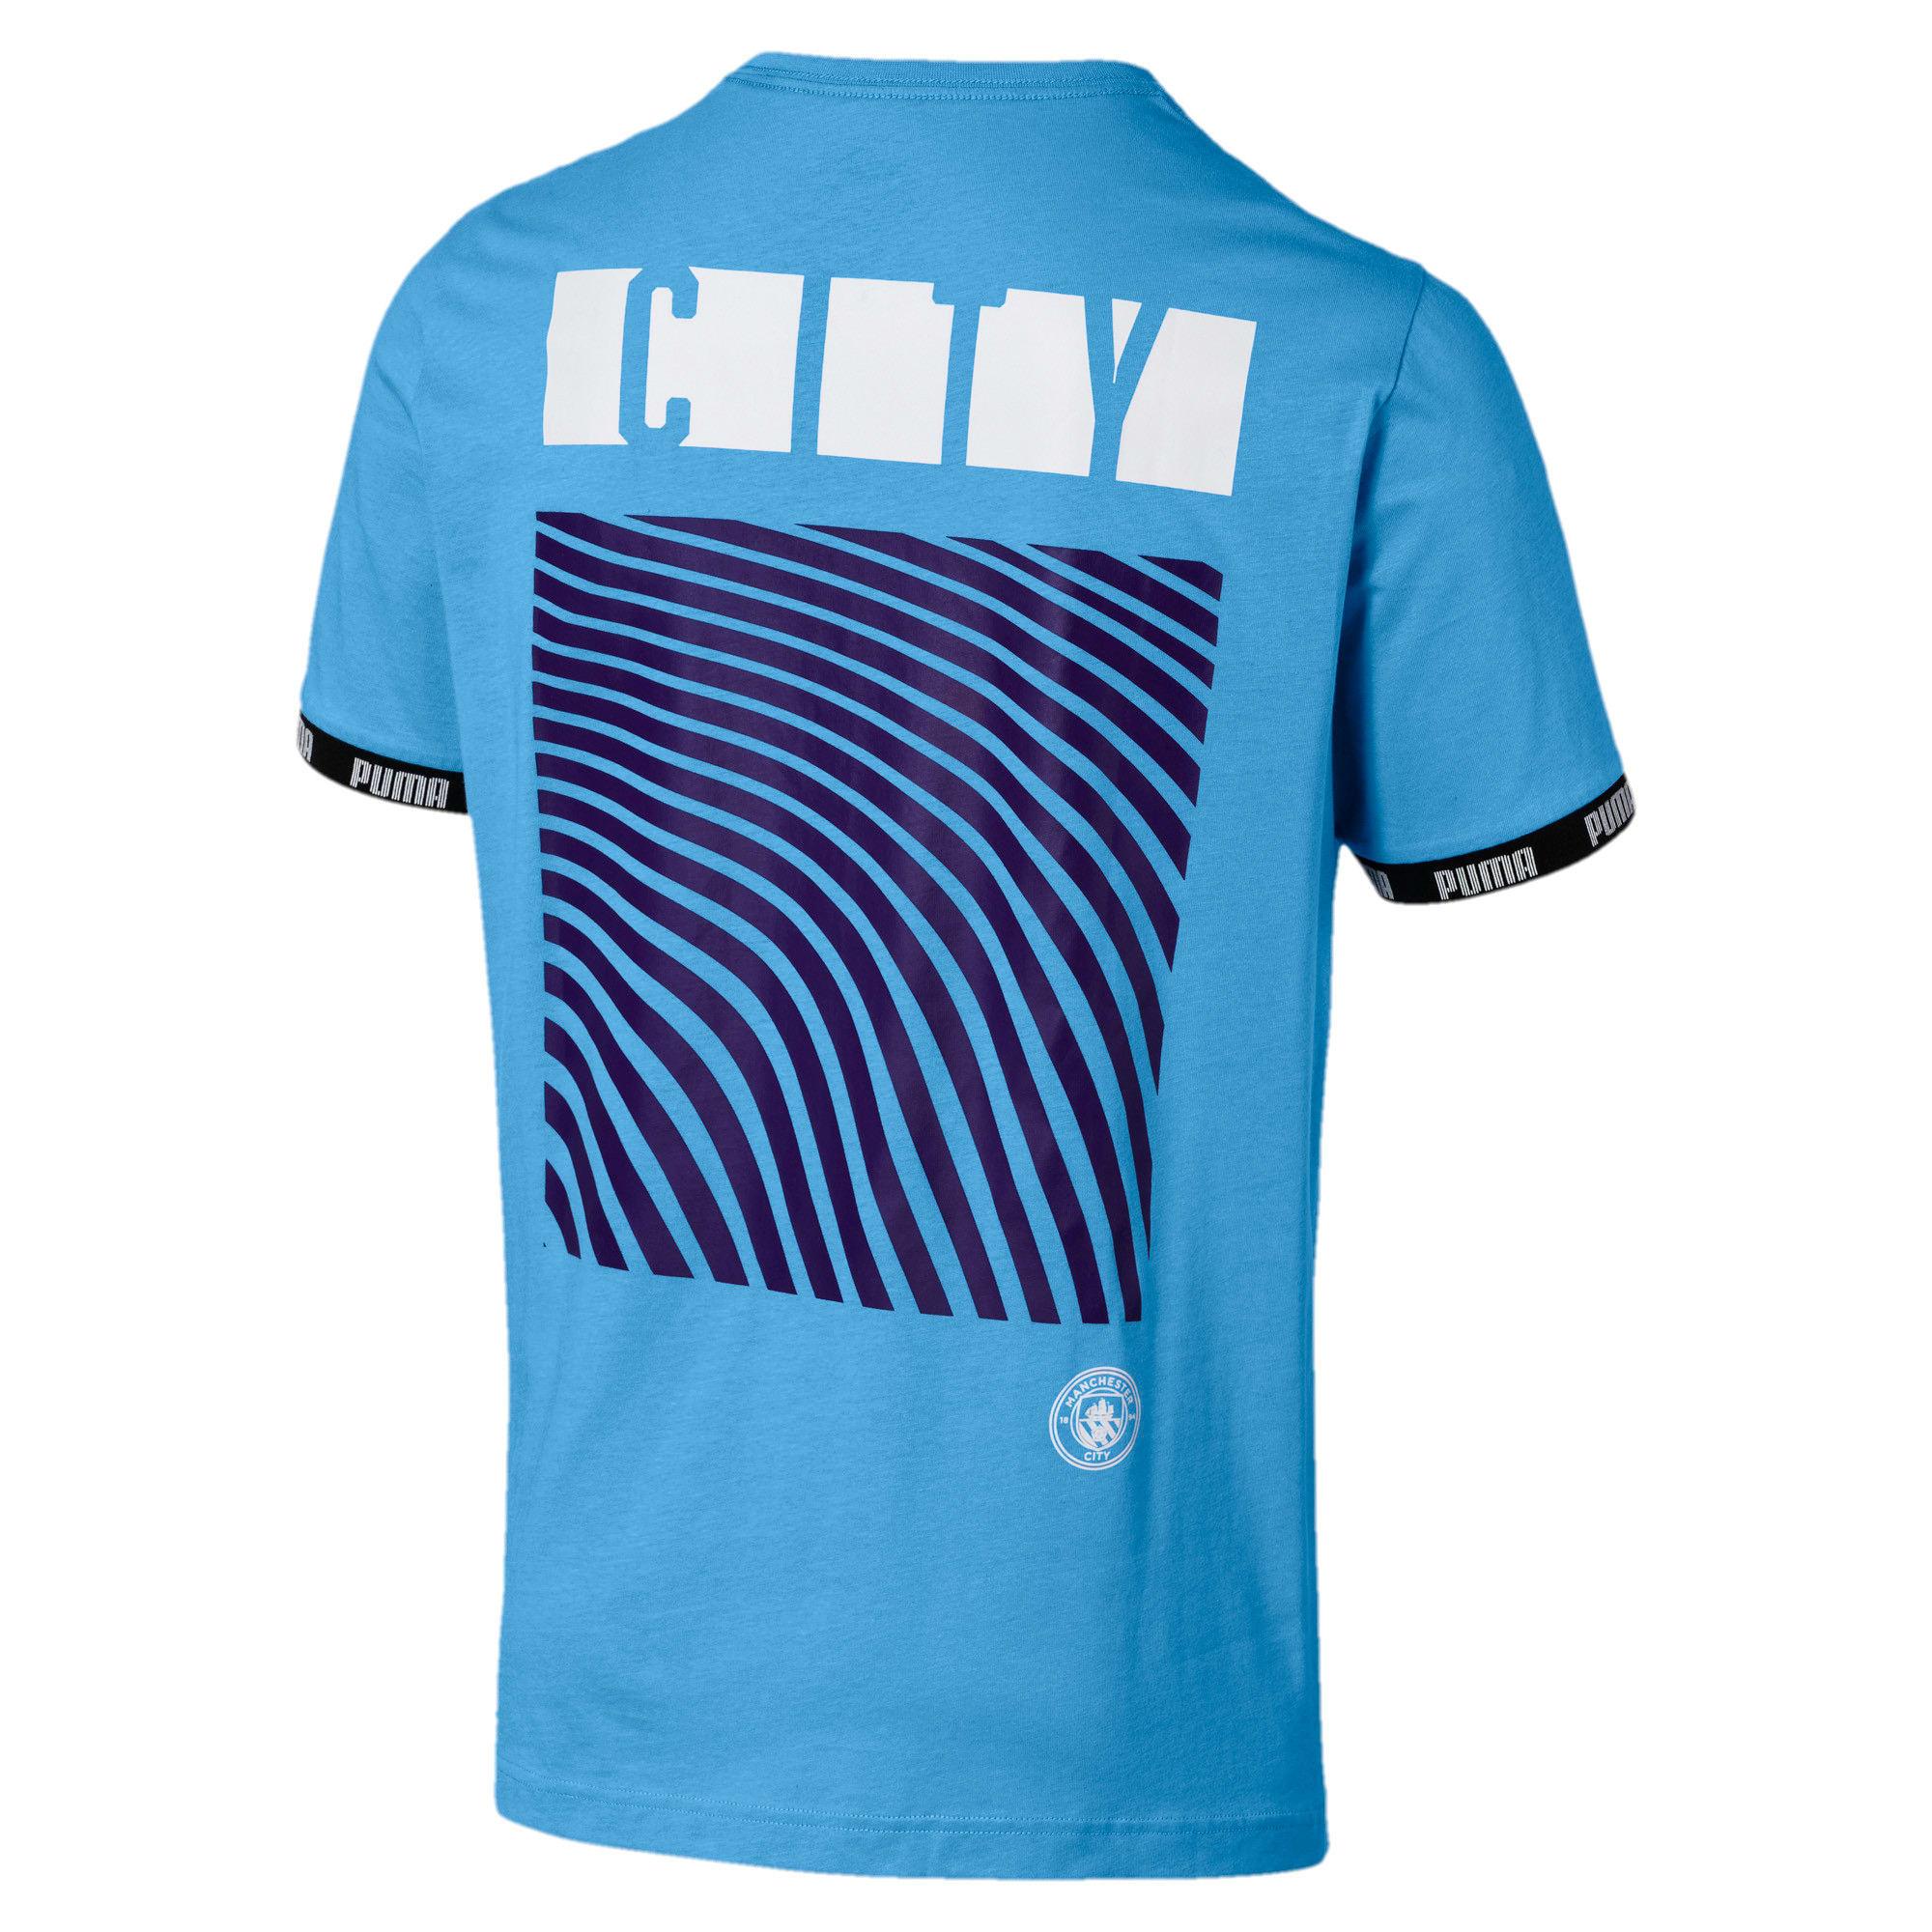 Thumbnail 2 of Manchester City FC FtblCulture Men's Tee, Team Light Blue, medium